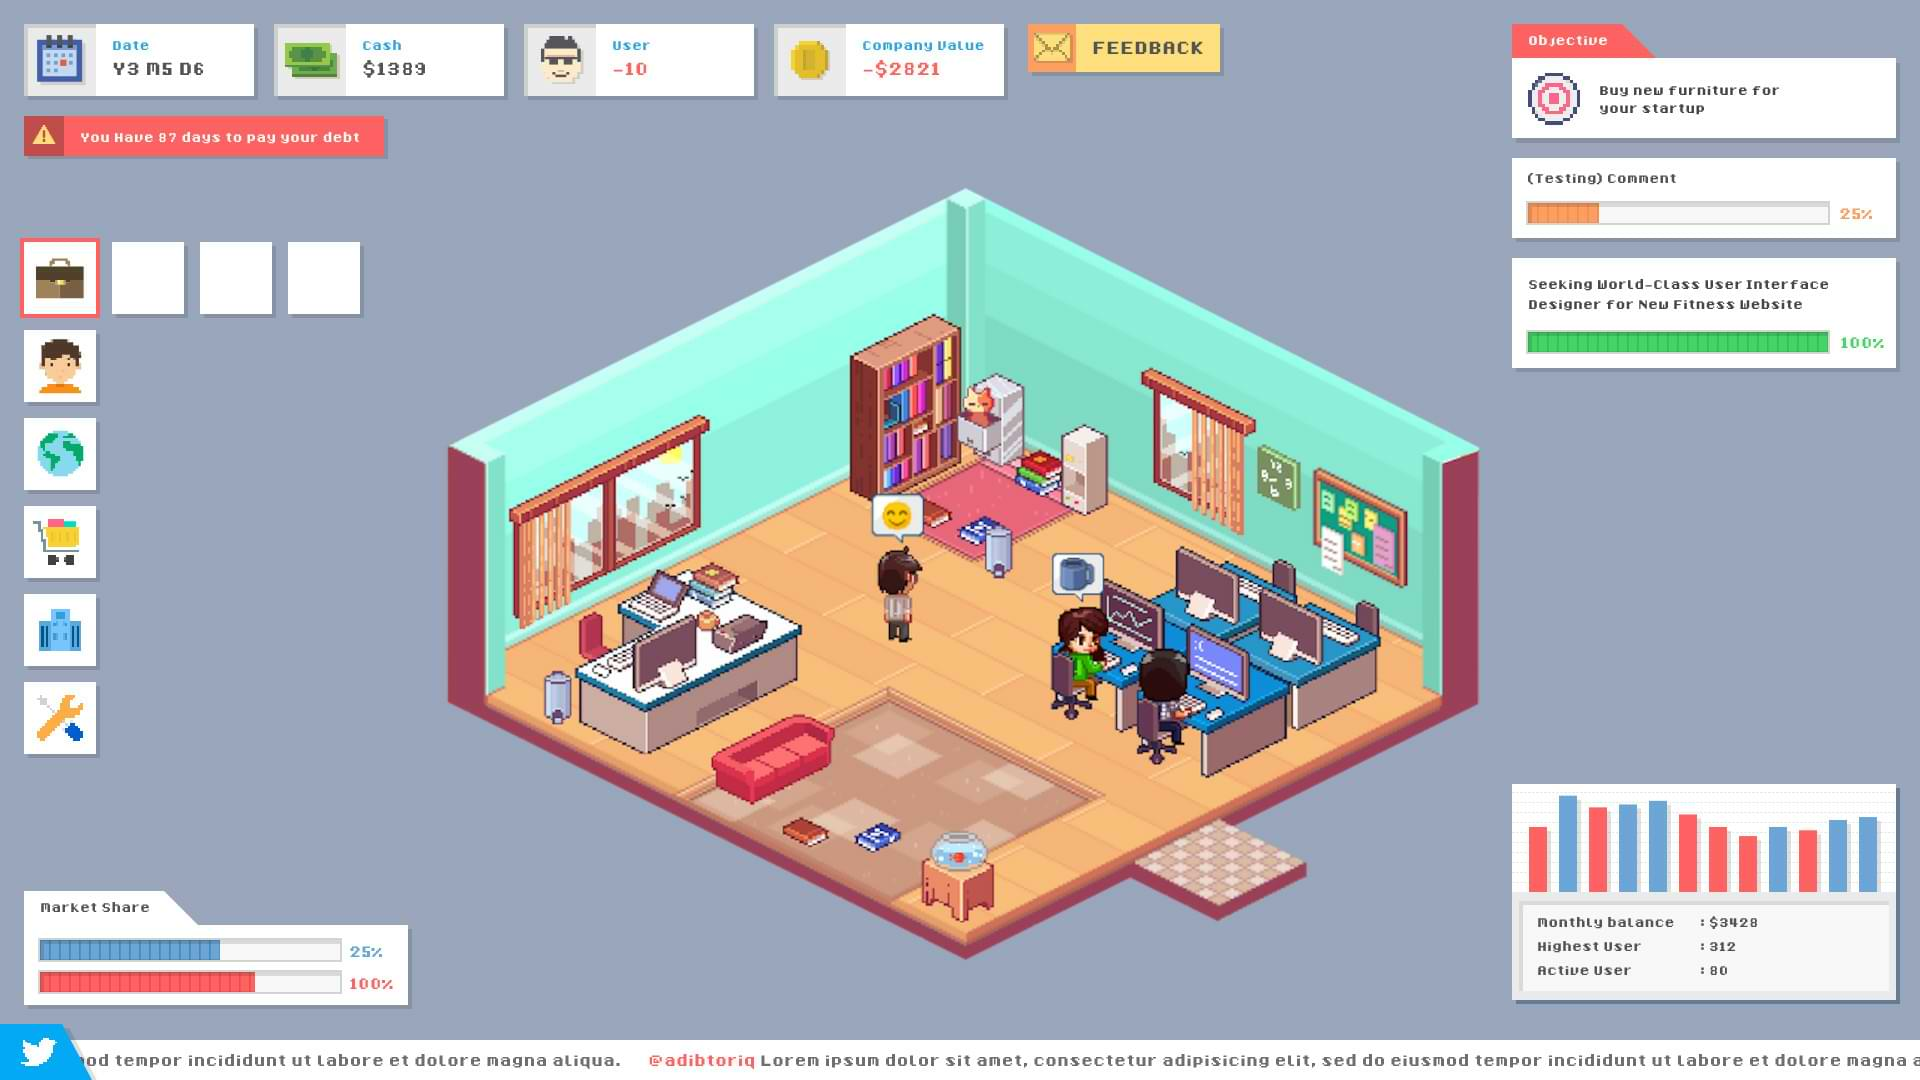 Startup Panic - Startup office